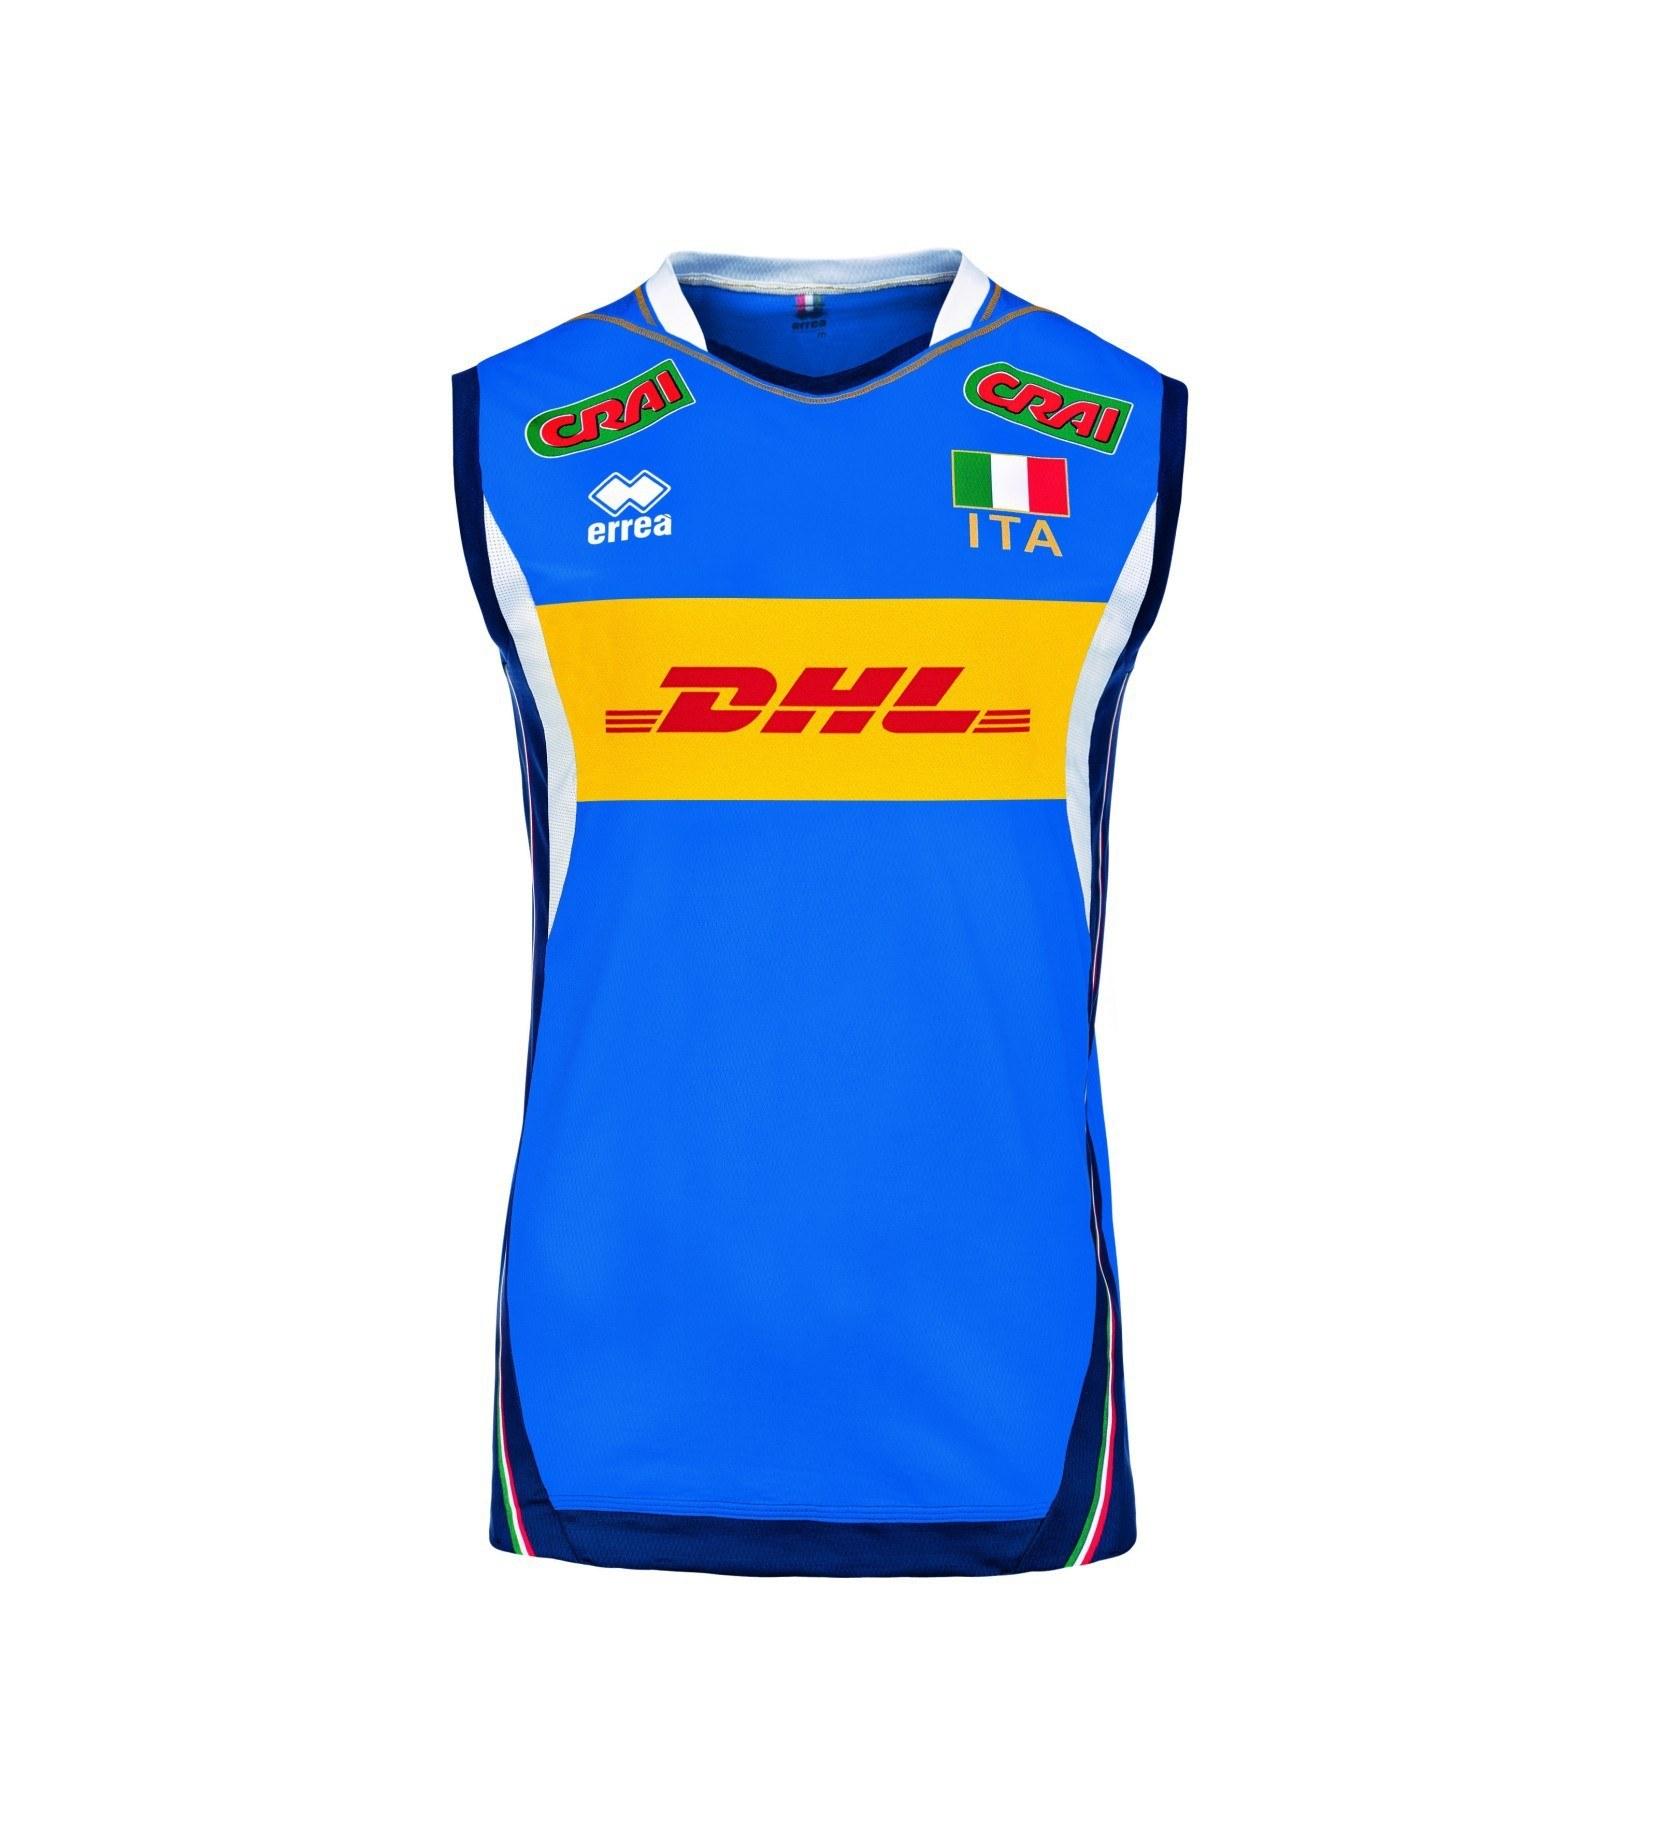 پیراهن تیم ملی والیبال ایتالیا